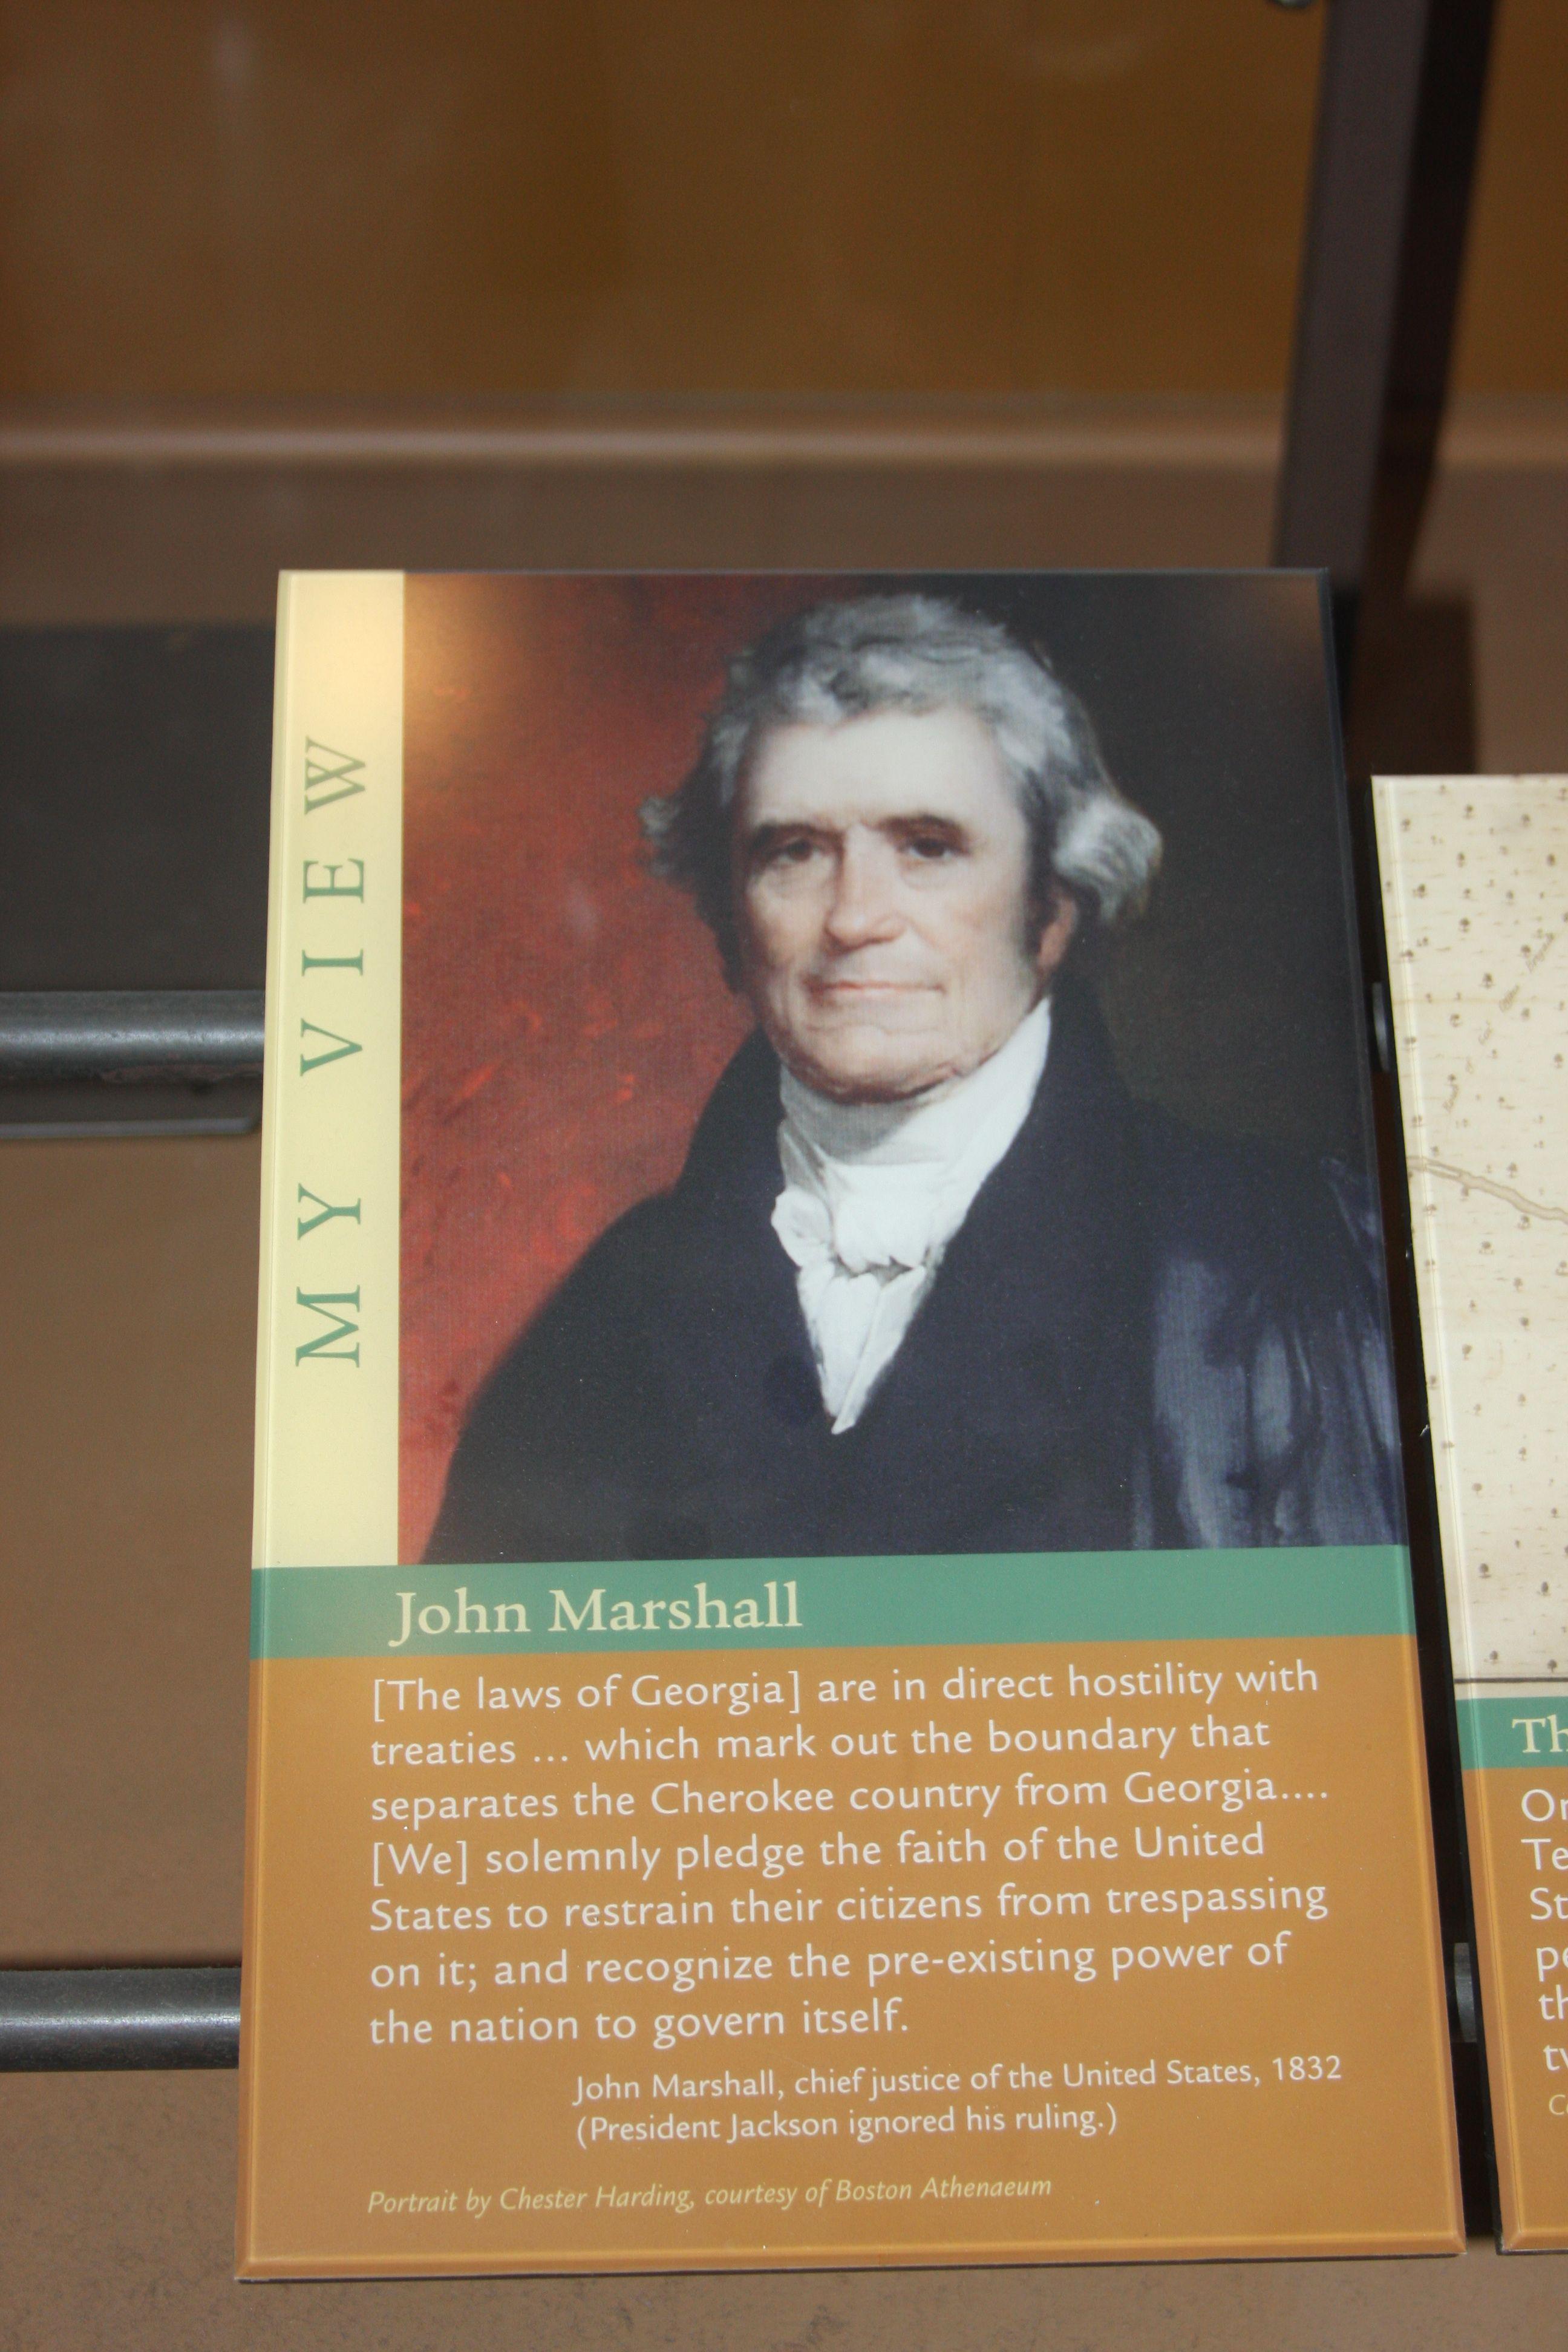 Sometimes History Takes Strange Turns This Cites John Marshall Regarding The Cherokee Nation Taking Their Land History Taking Trail Of Tears Cherokee Nation